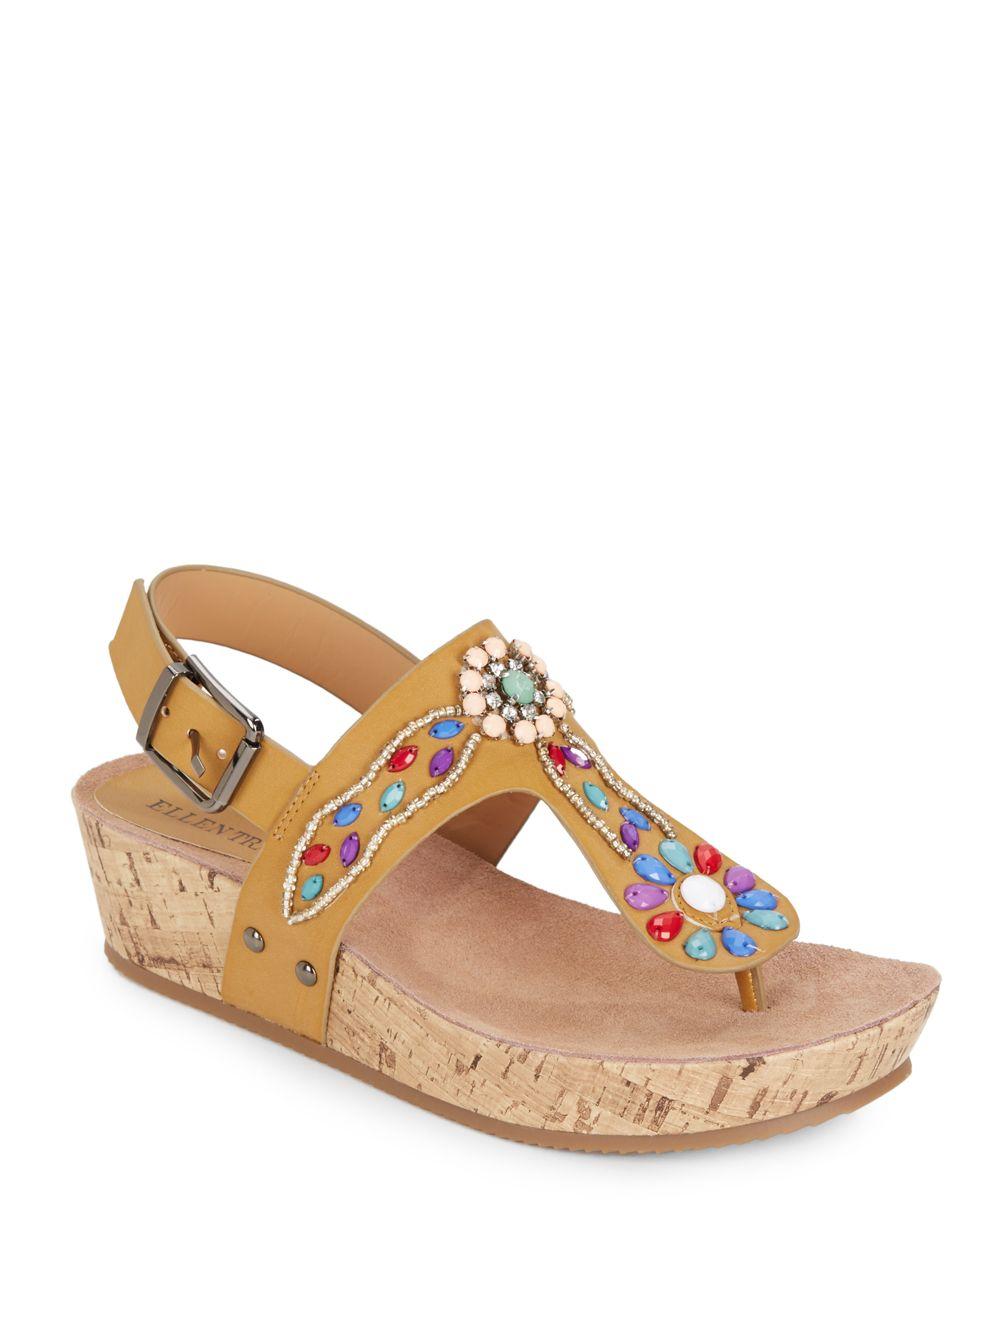 b54f4df3aa9 Lyst - Ellen Tracy Itani Embellished Leather Platform Sandals